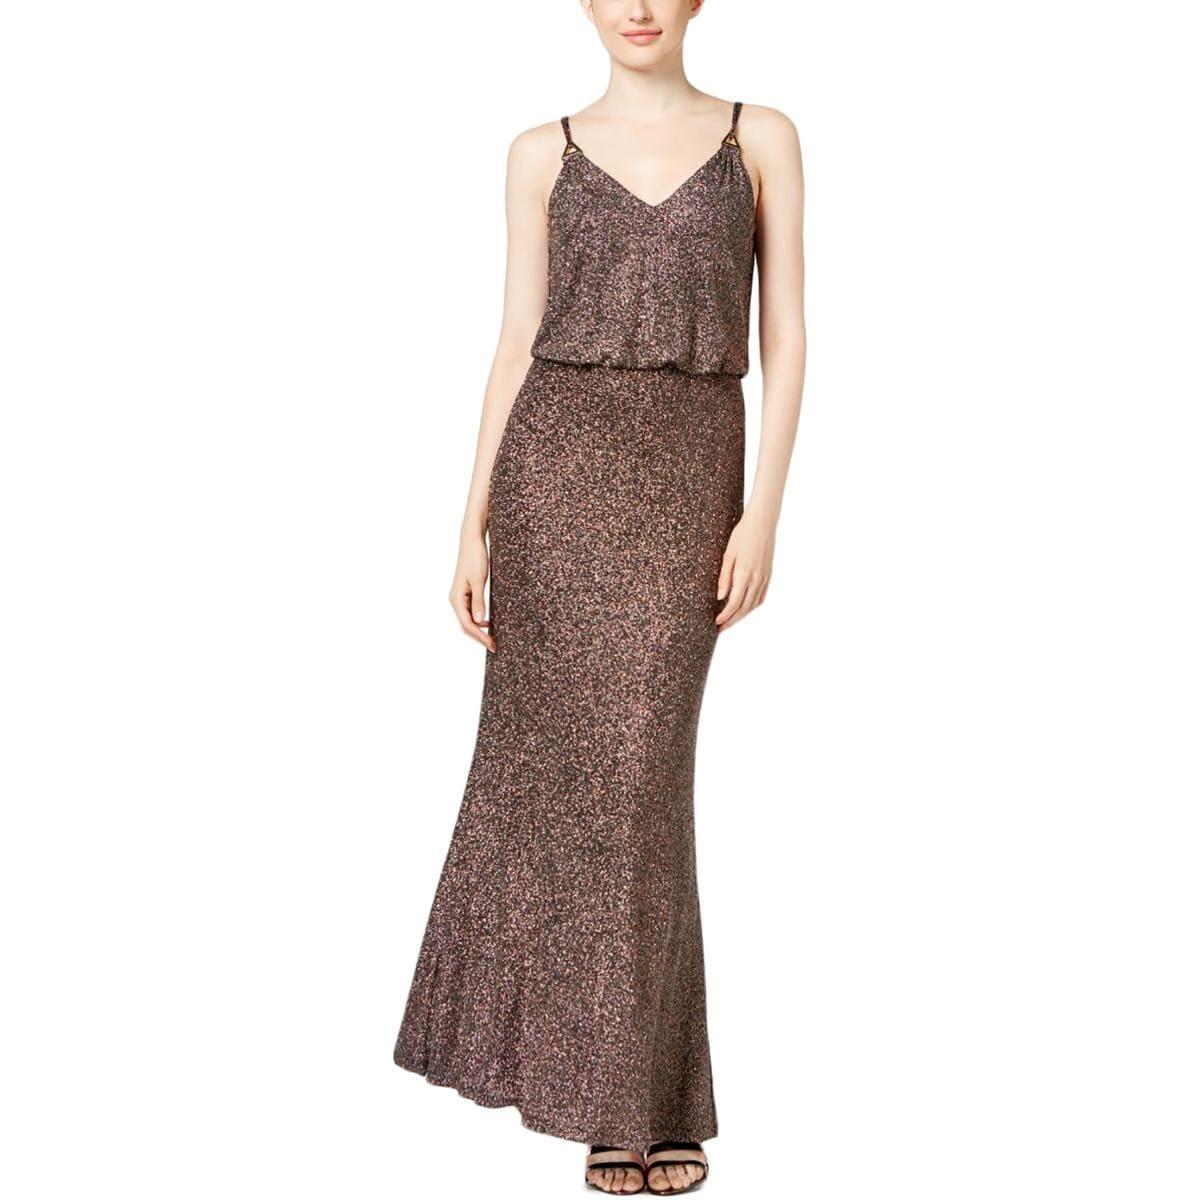 Calvin Klein Womens Evening Dress Metallic Blouson - 12 - Free ...